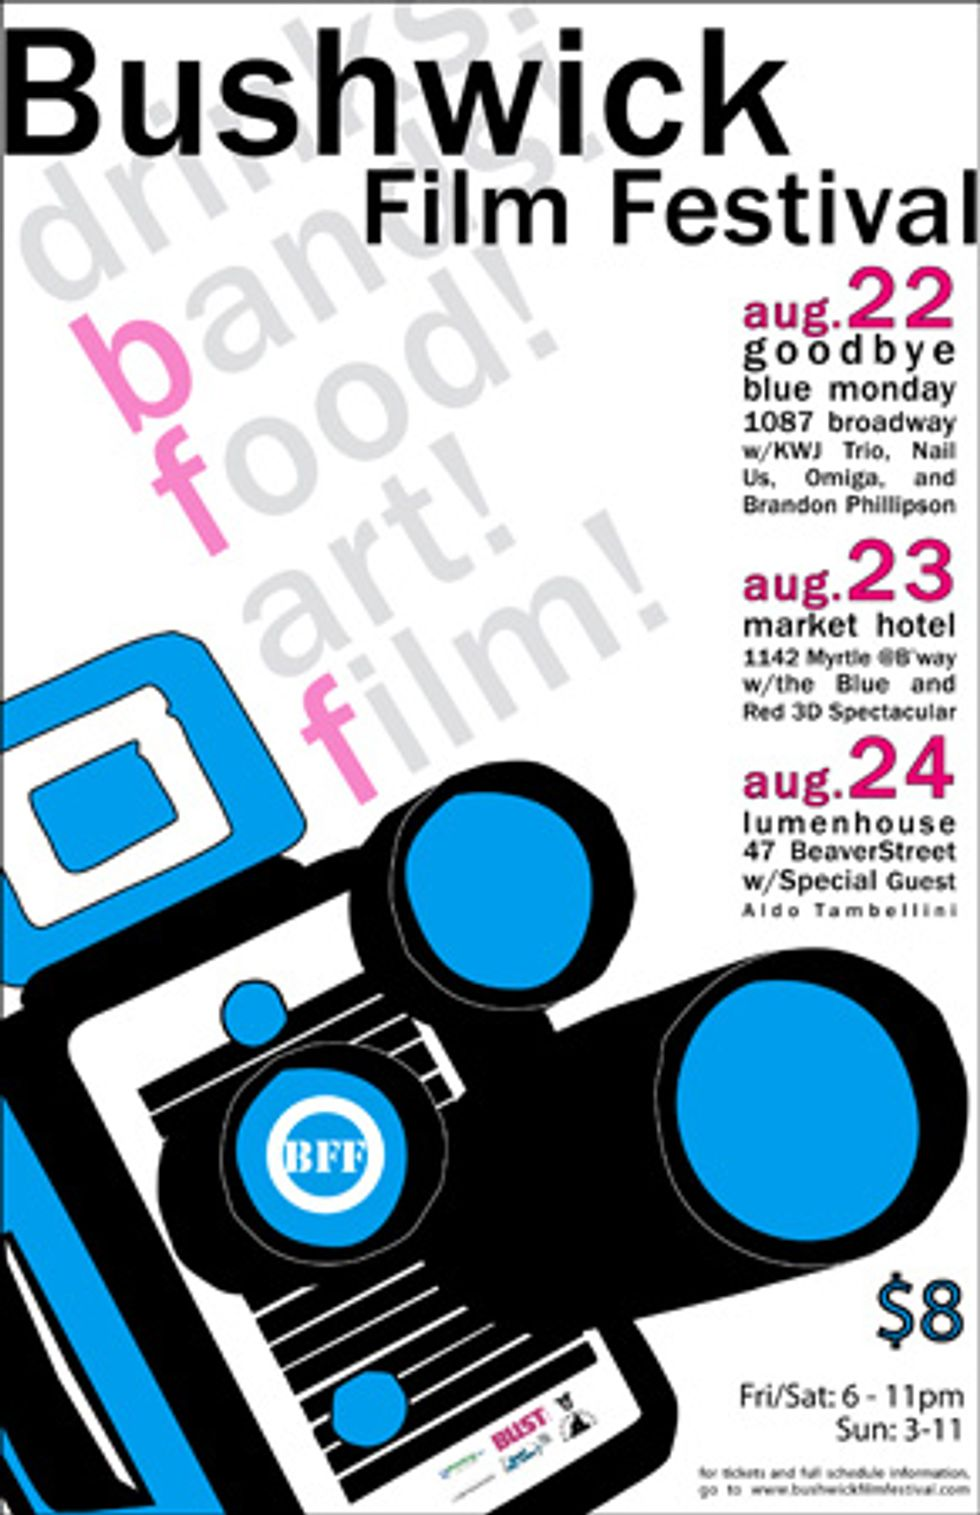 Bushwick Film Festival to Screen Sean Glass's Latest Short Benefits.